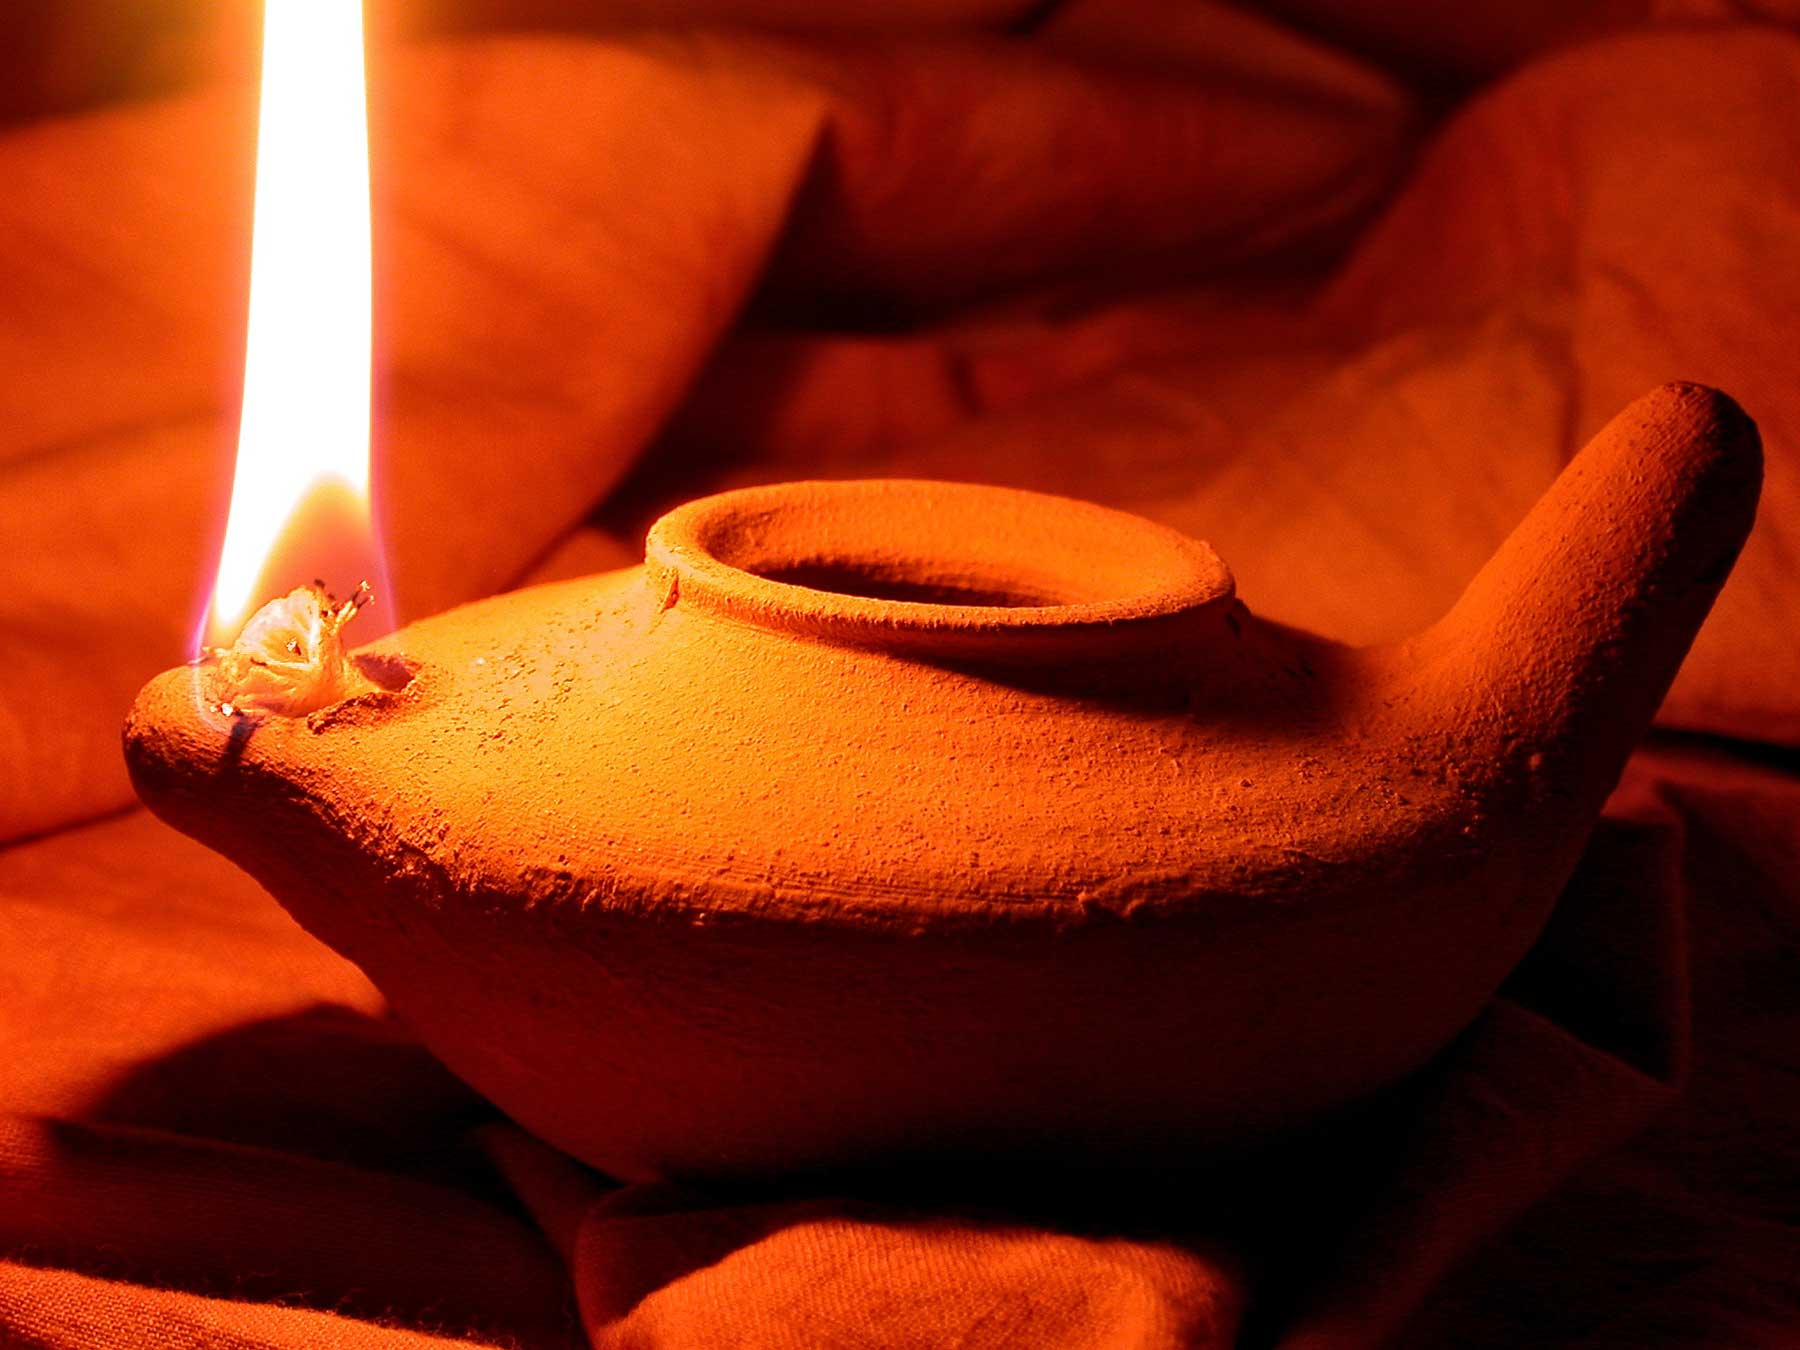 Clay olive oil lamp alight